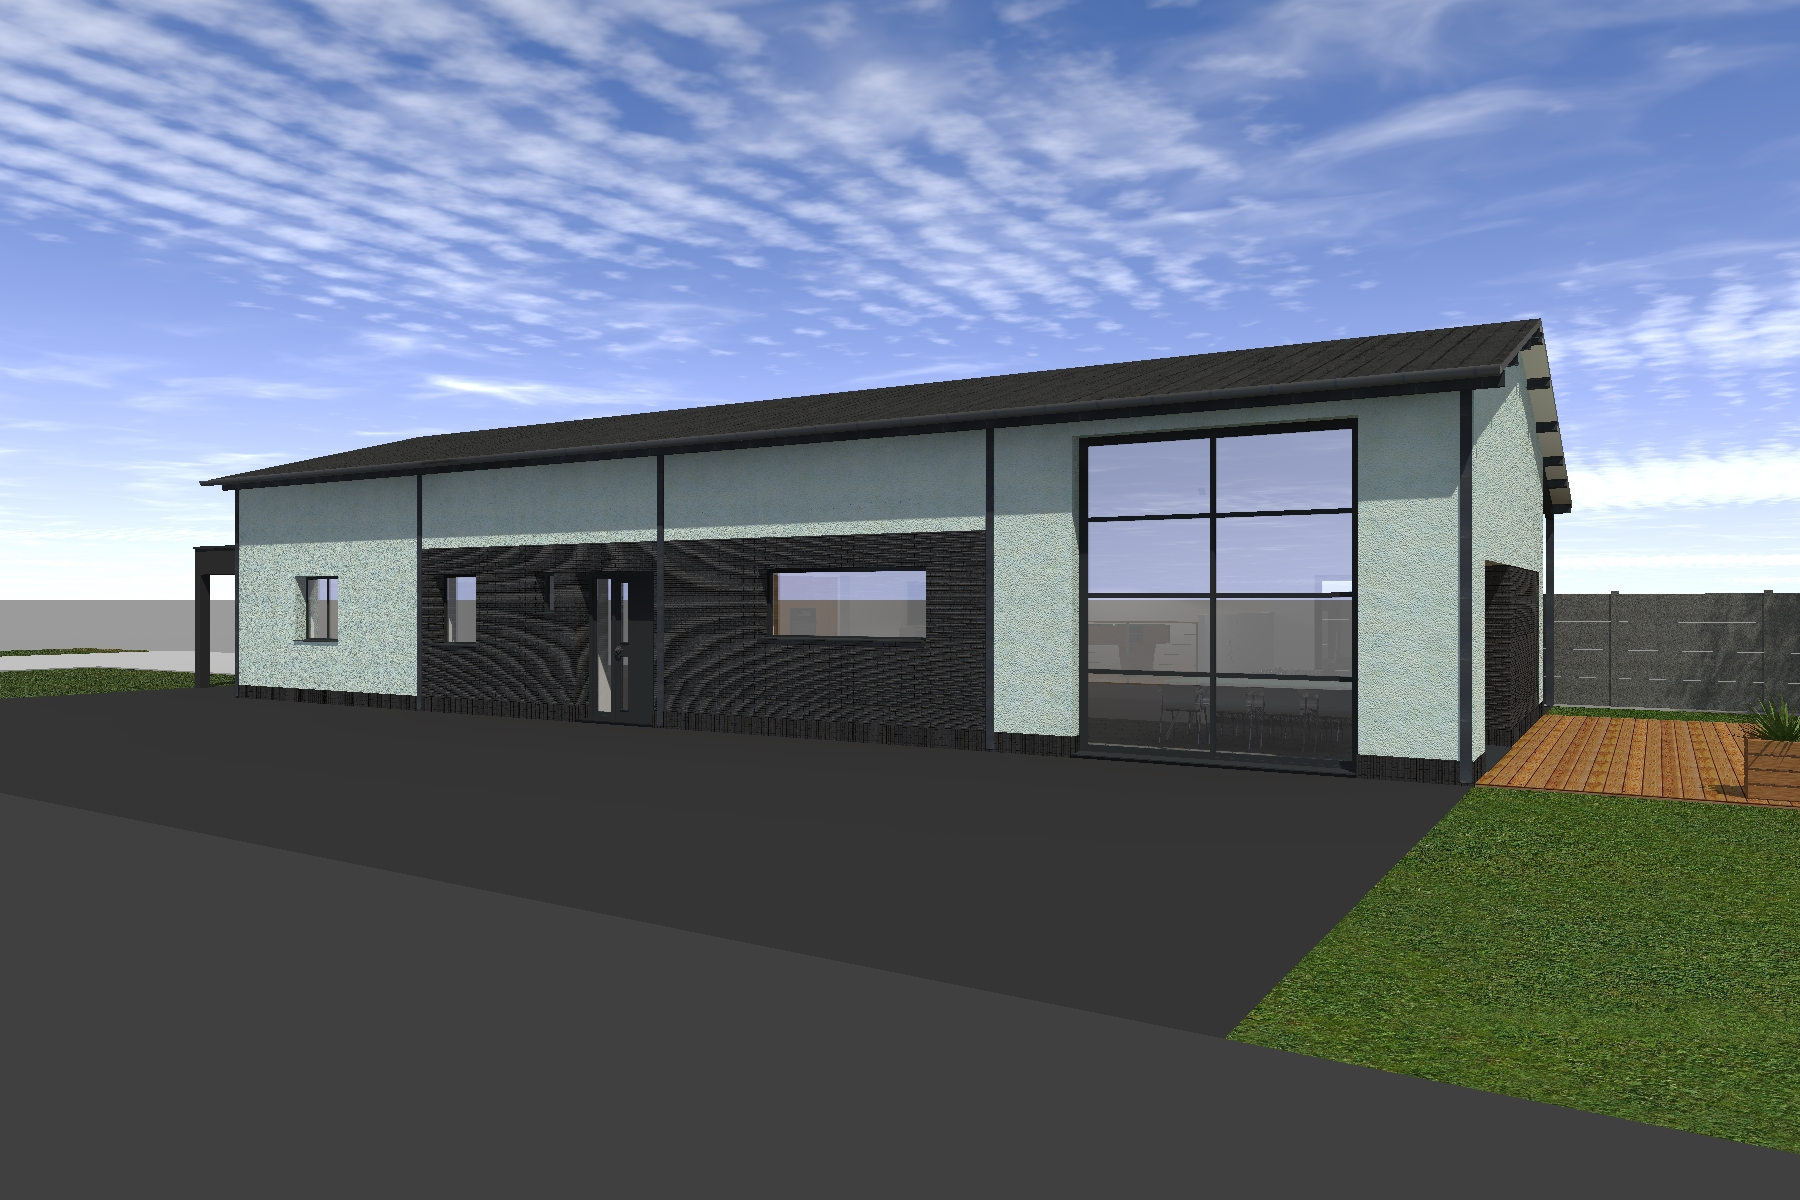 Transformation d 39 un hangar en habitation loft bois bernard - Amenagement hangar en habitation ...